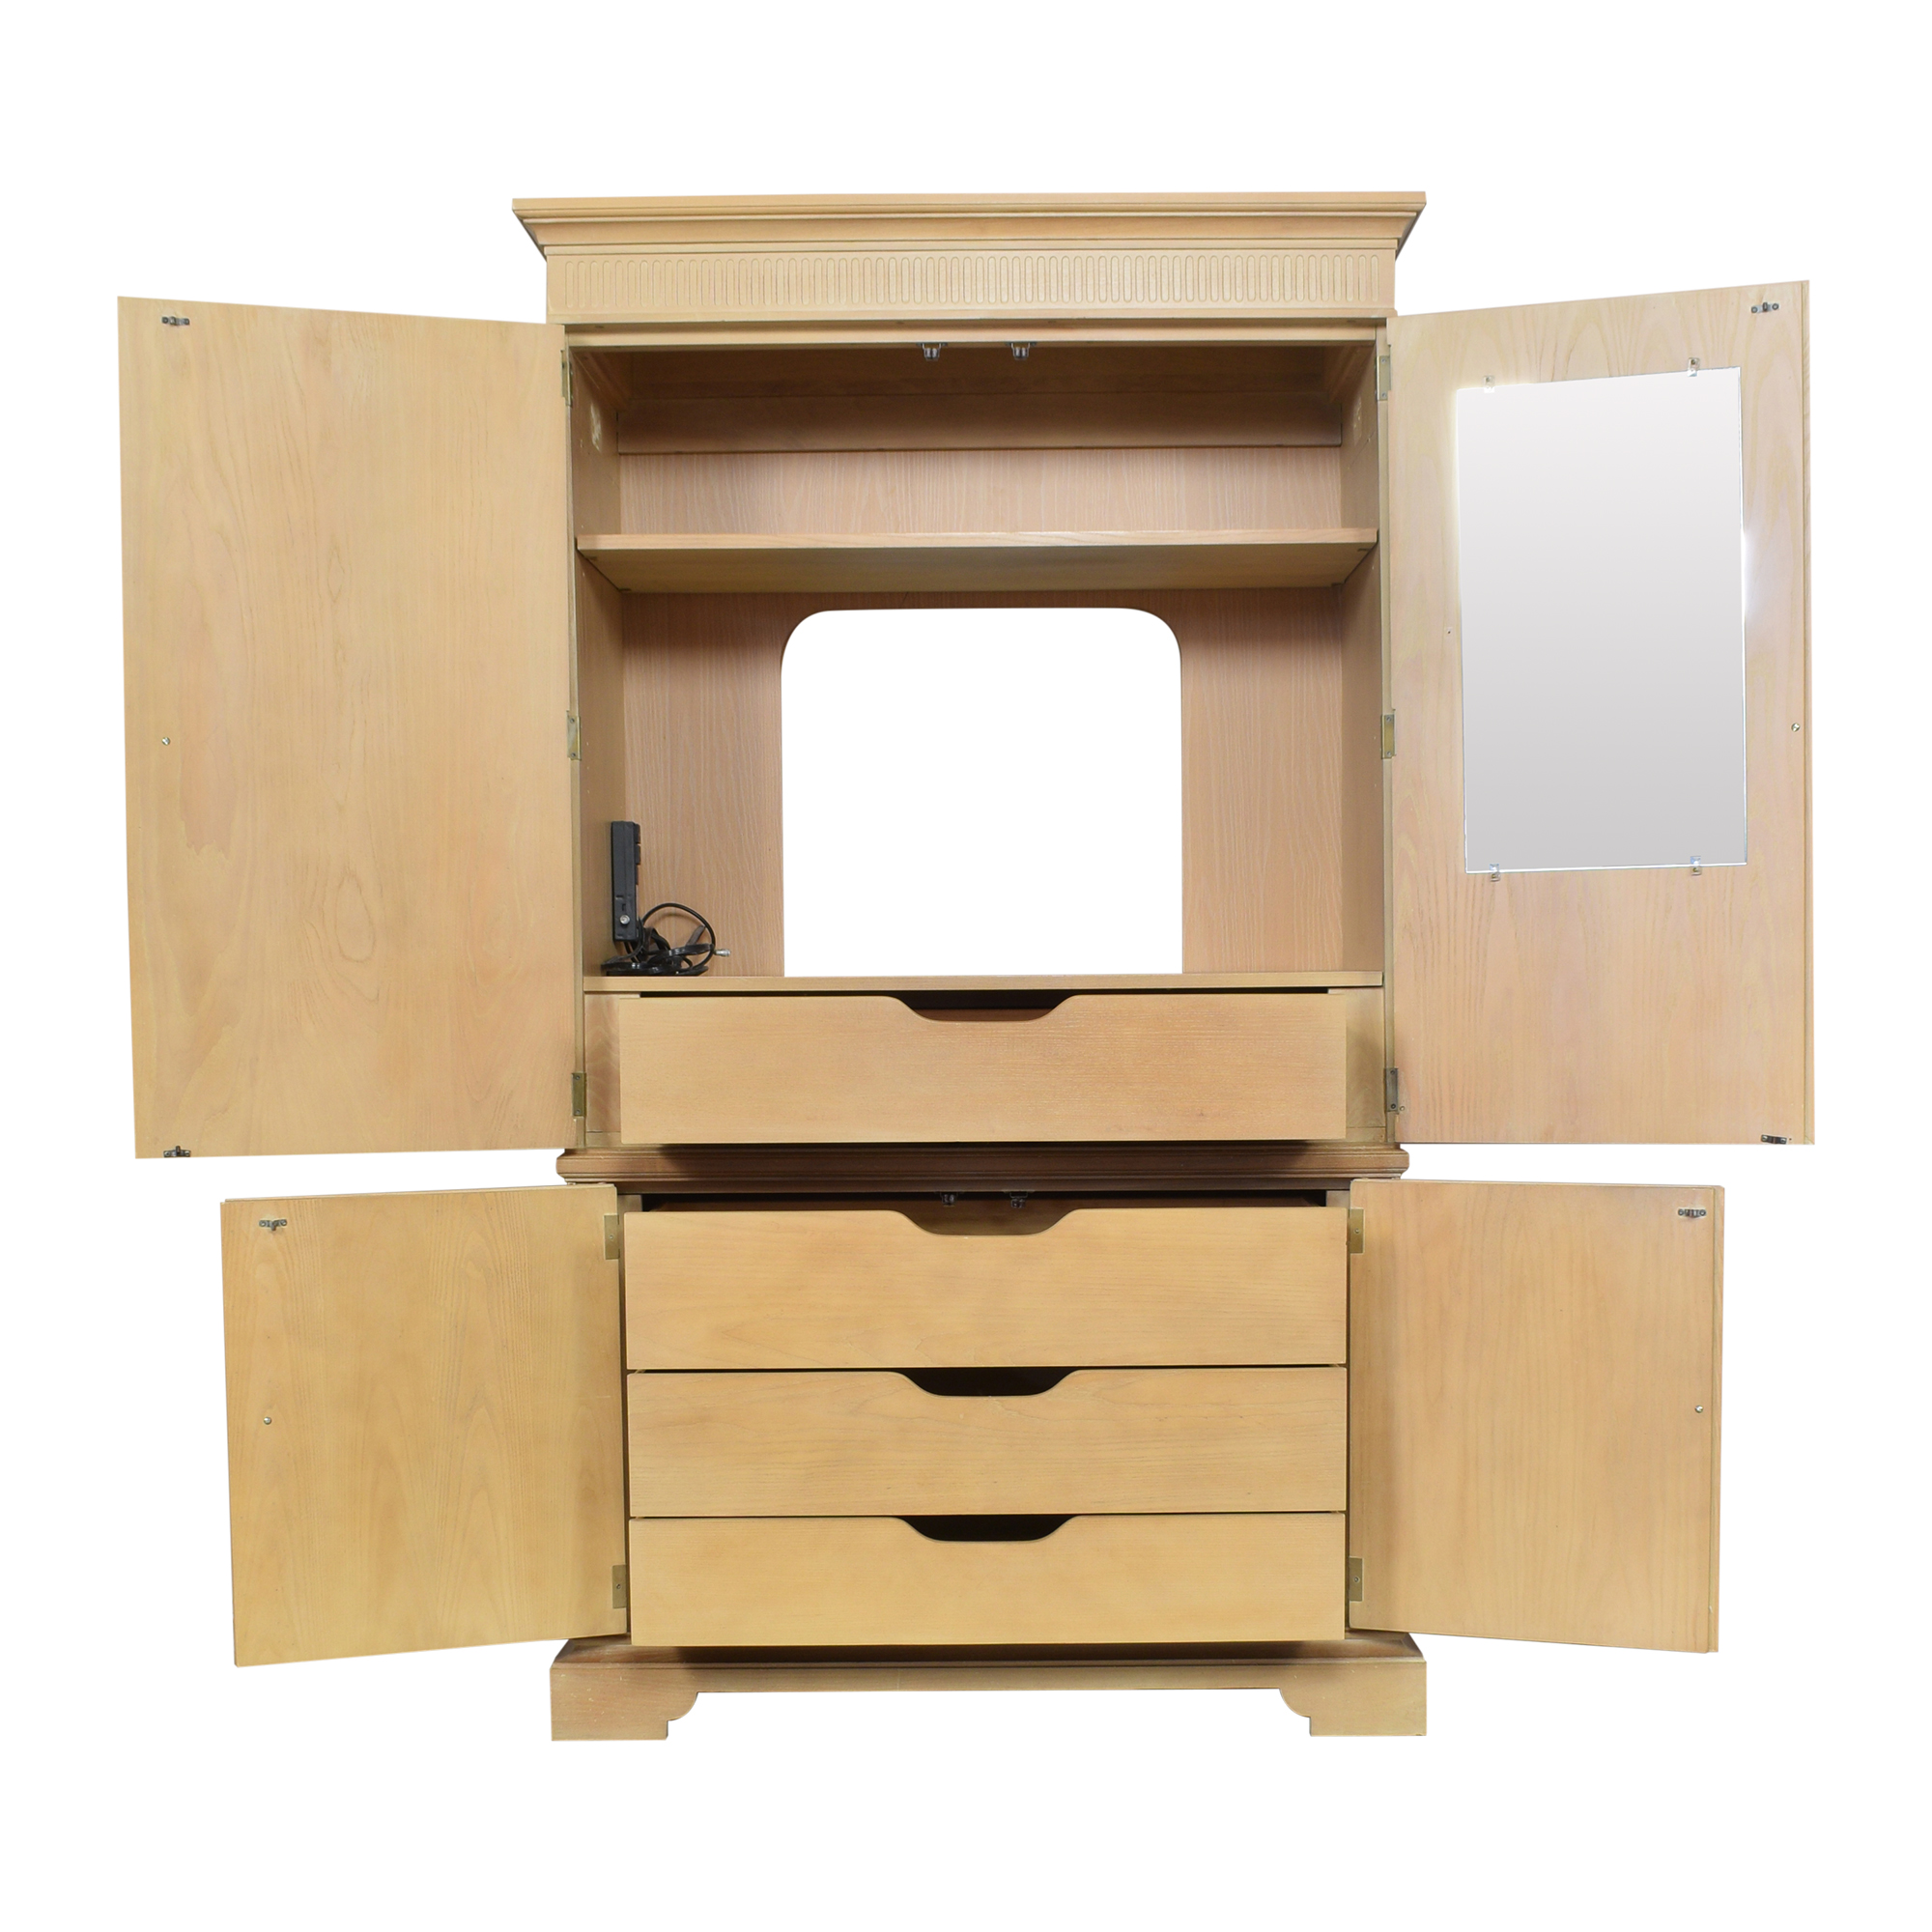 Stanley Furniture Stanley Furniture Media Armoire Storage